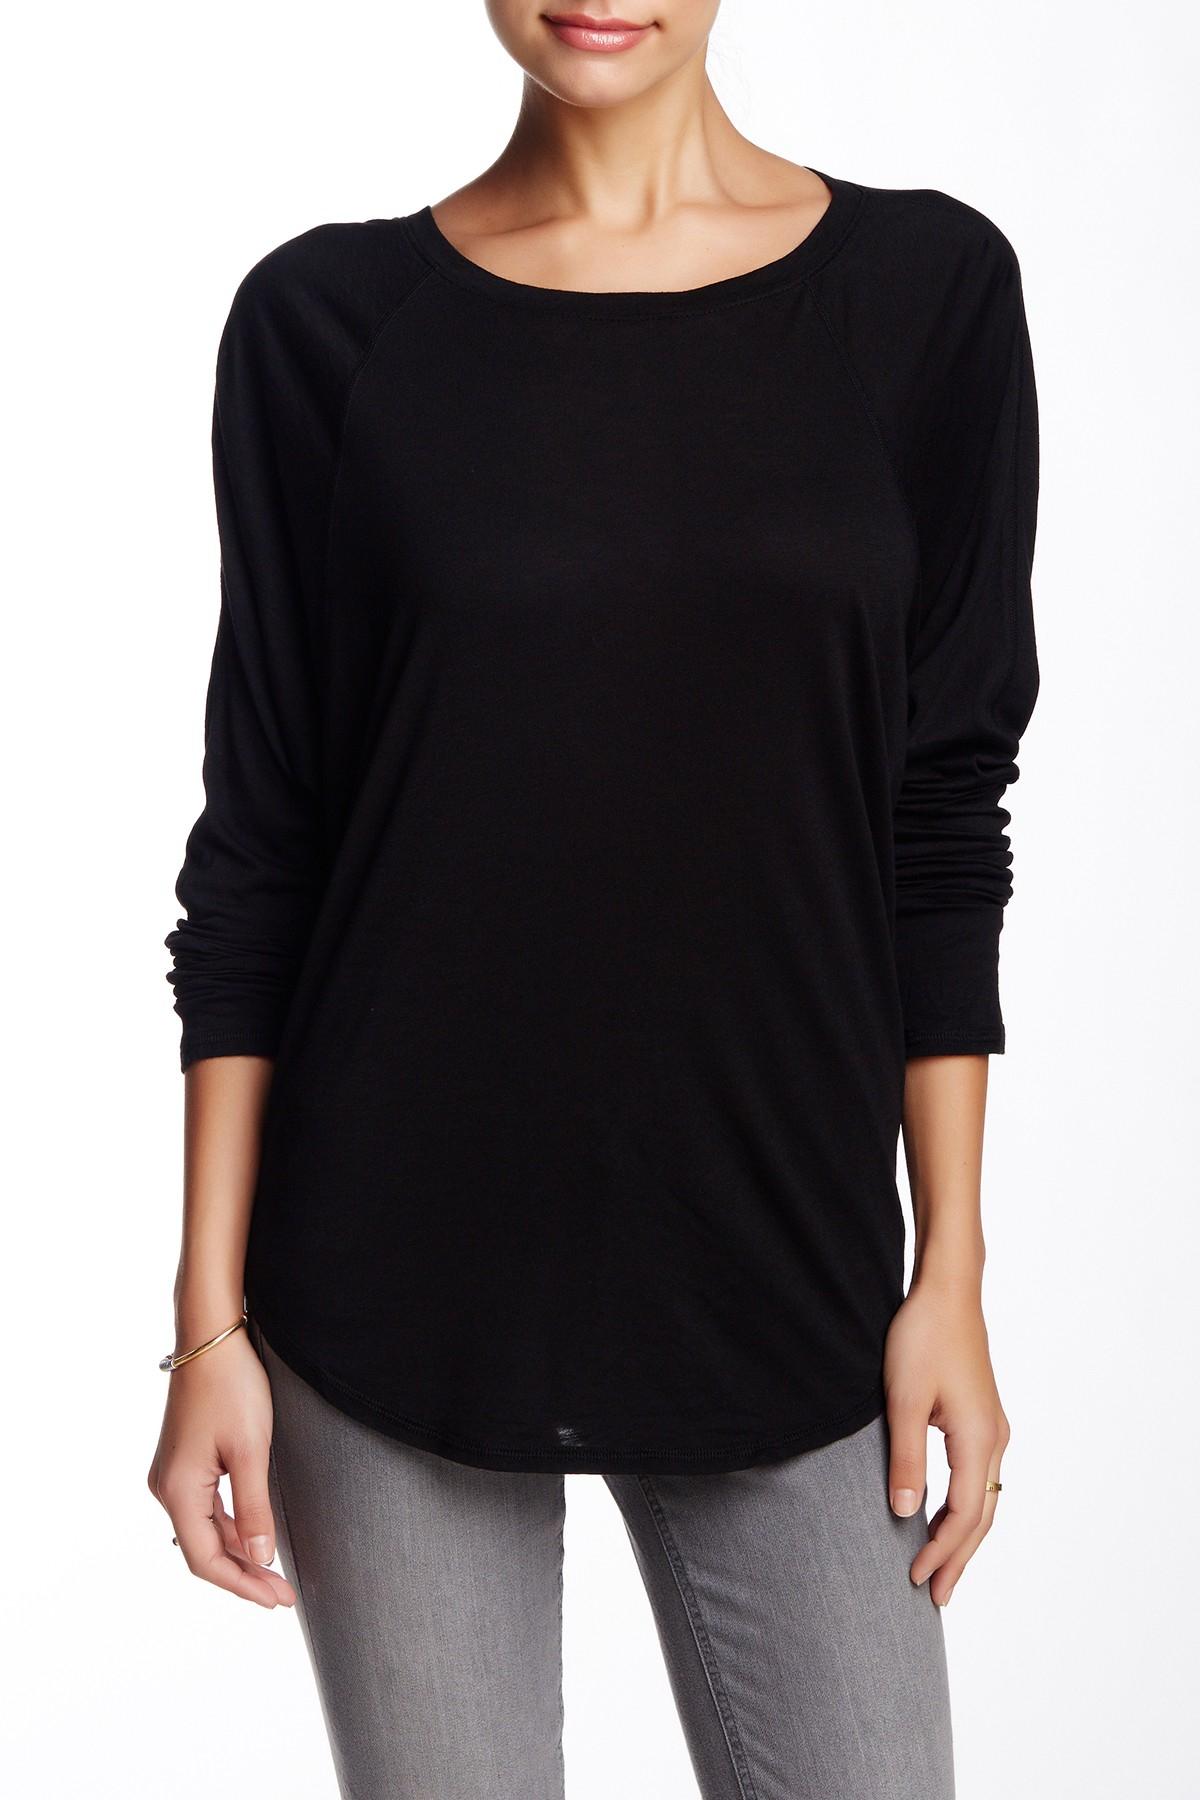 Michael stars raglan dolman tee in black lyst for Michael stars tee shirts